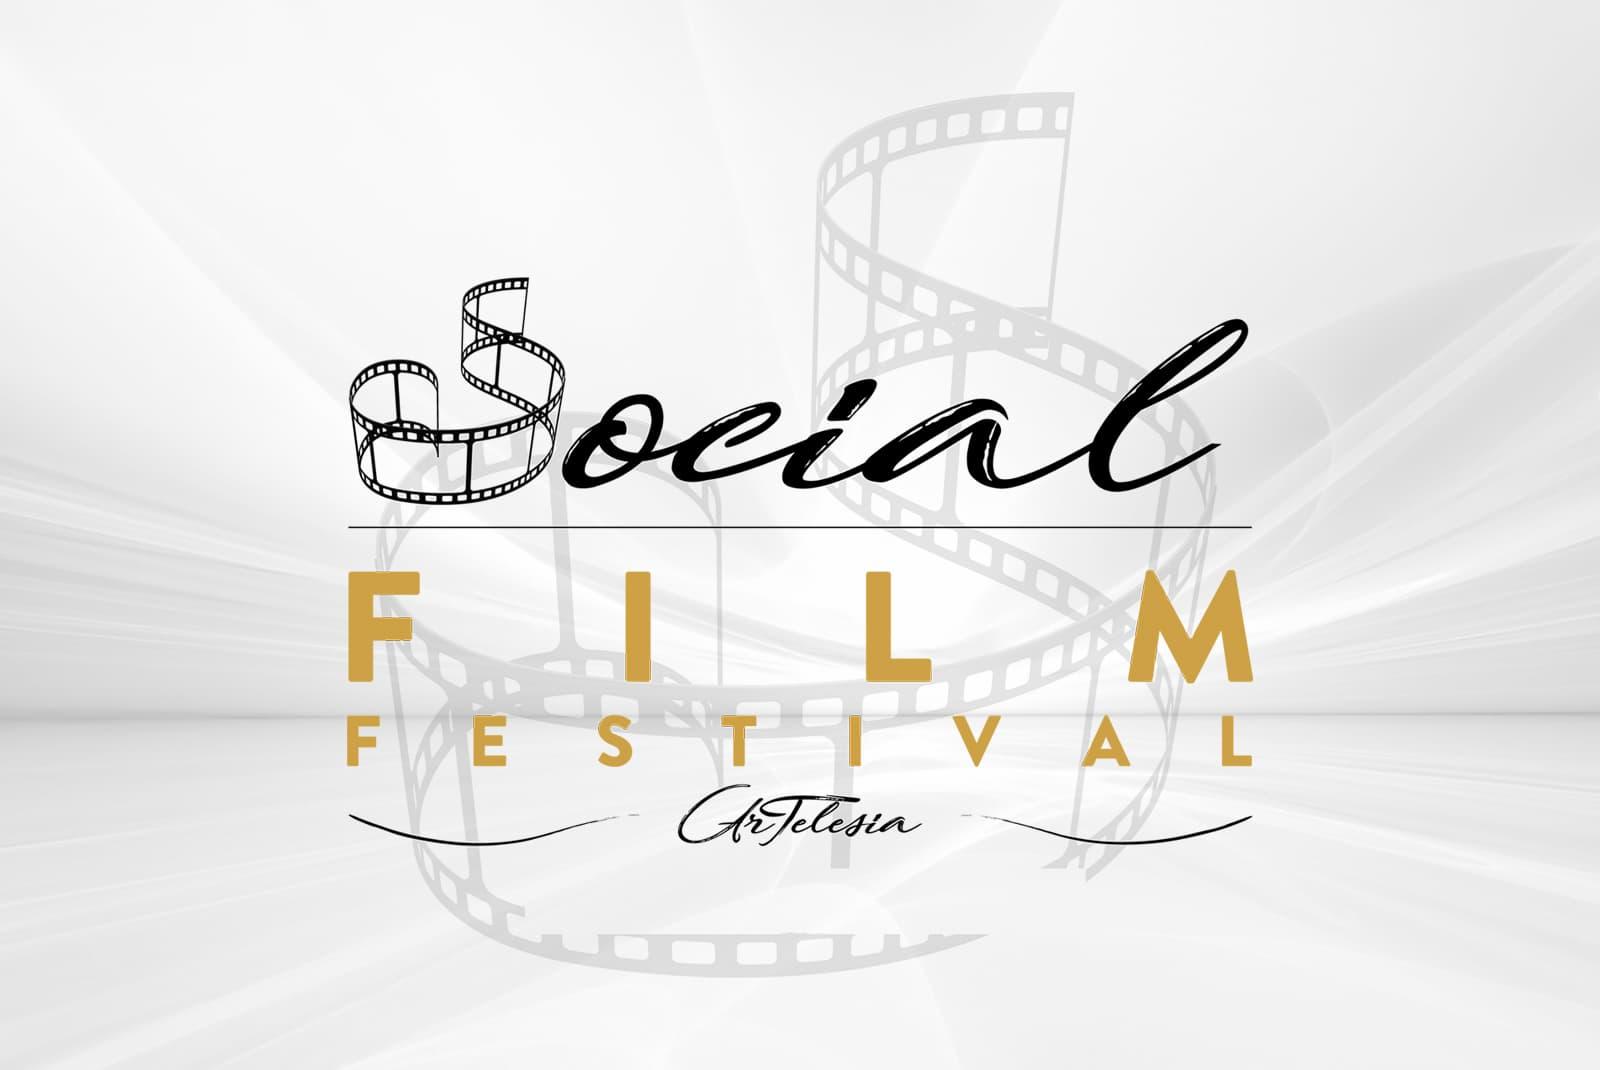 Festival del Cinema Social ArTelesia